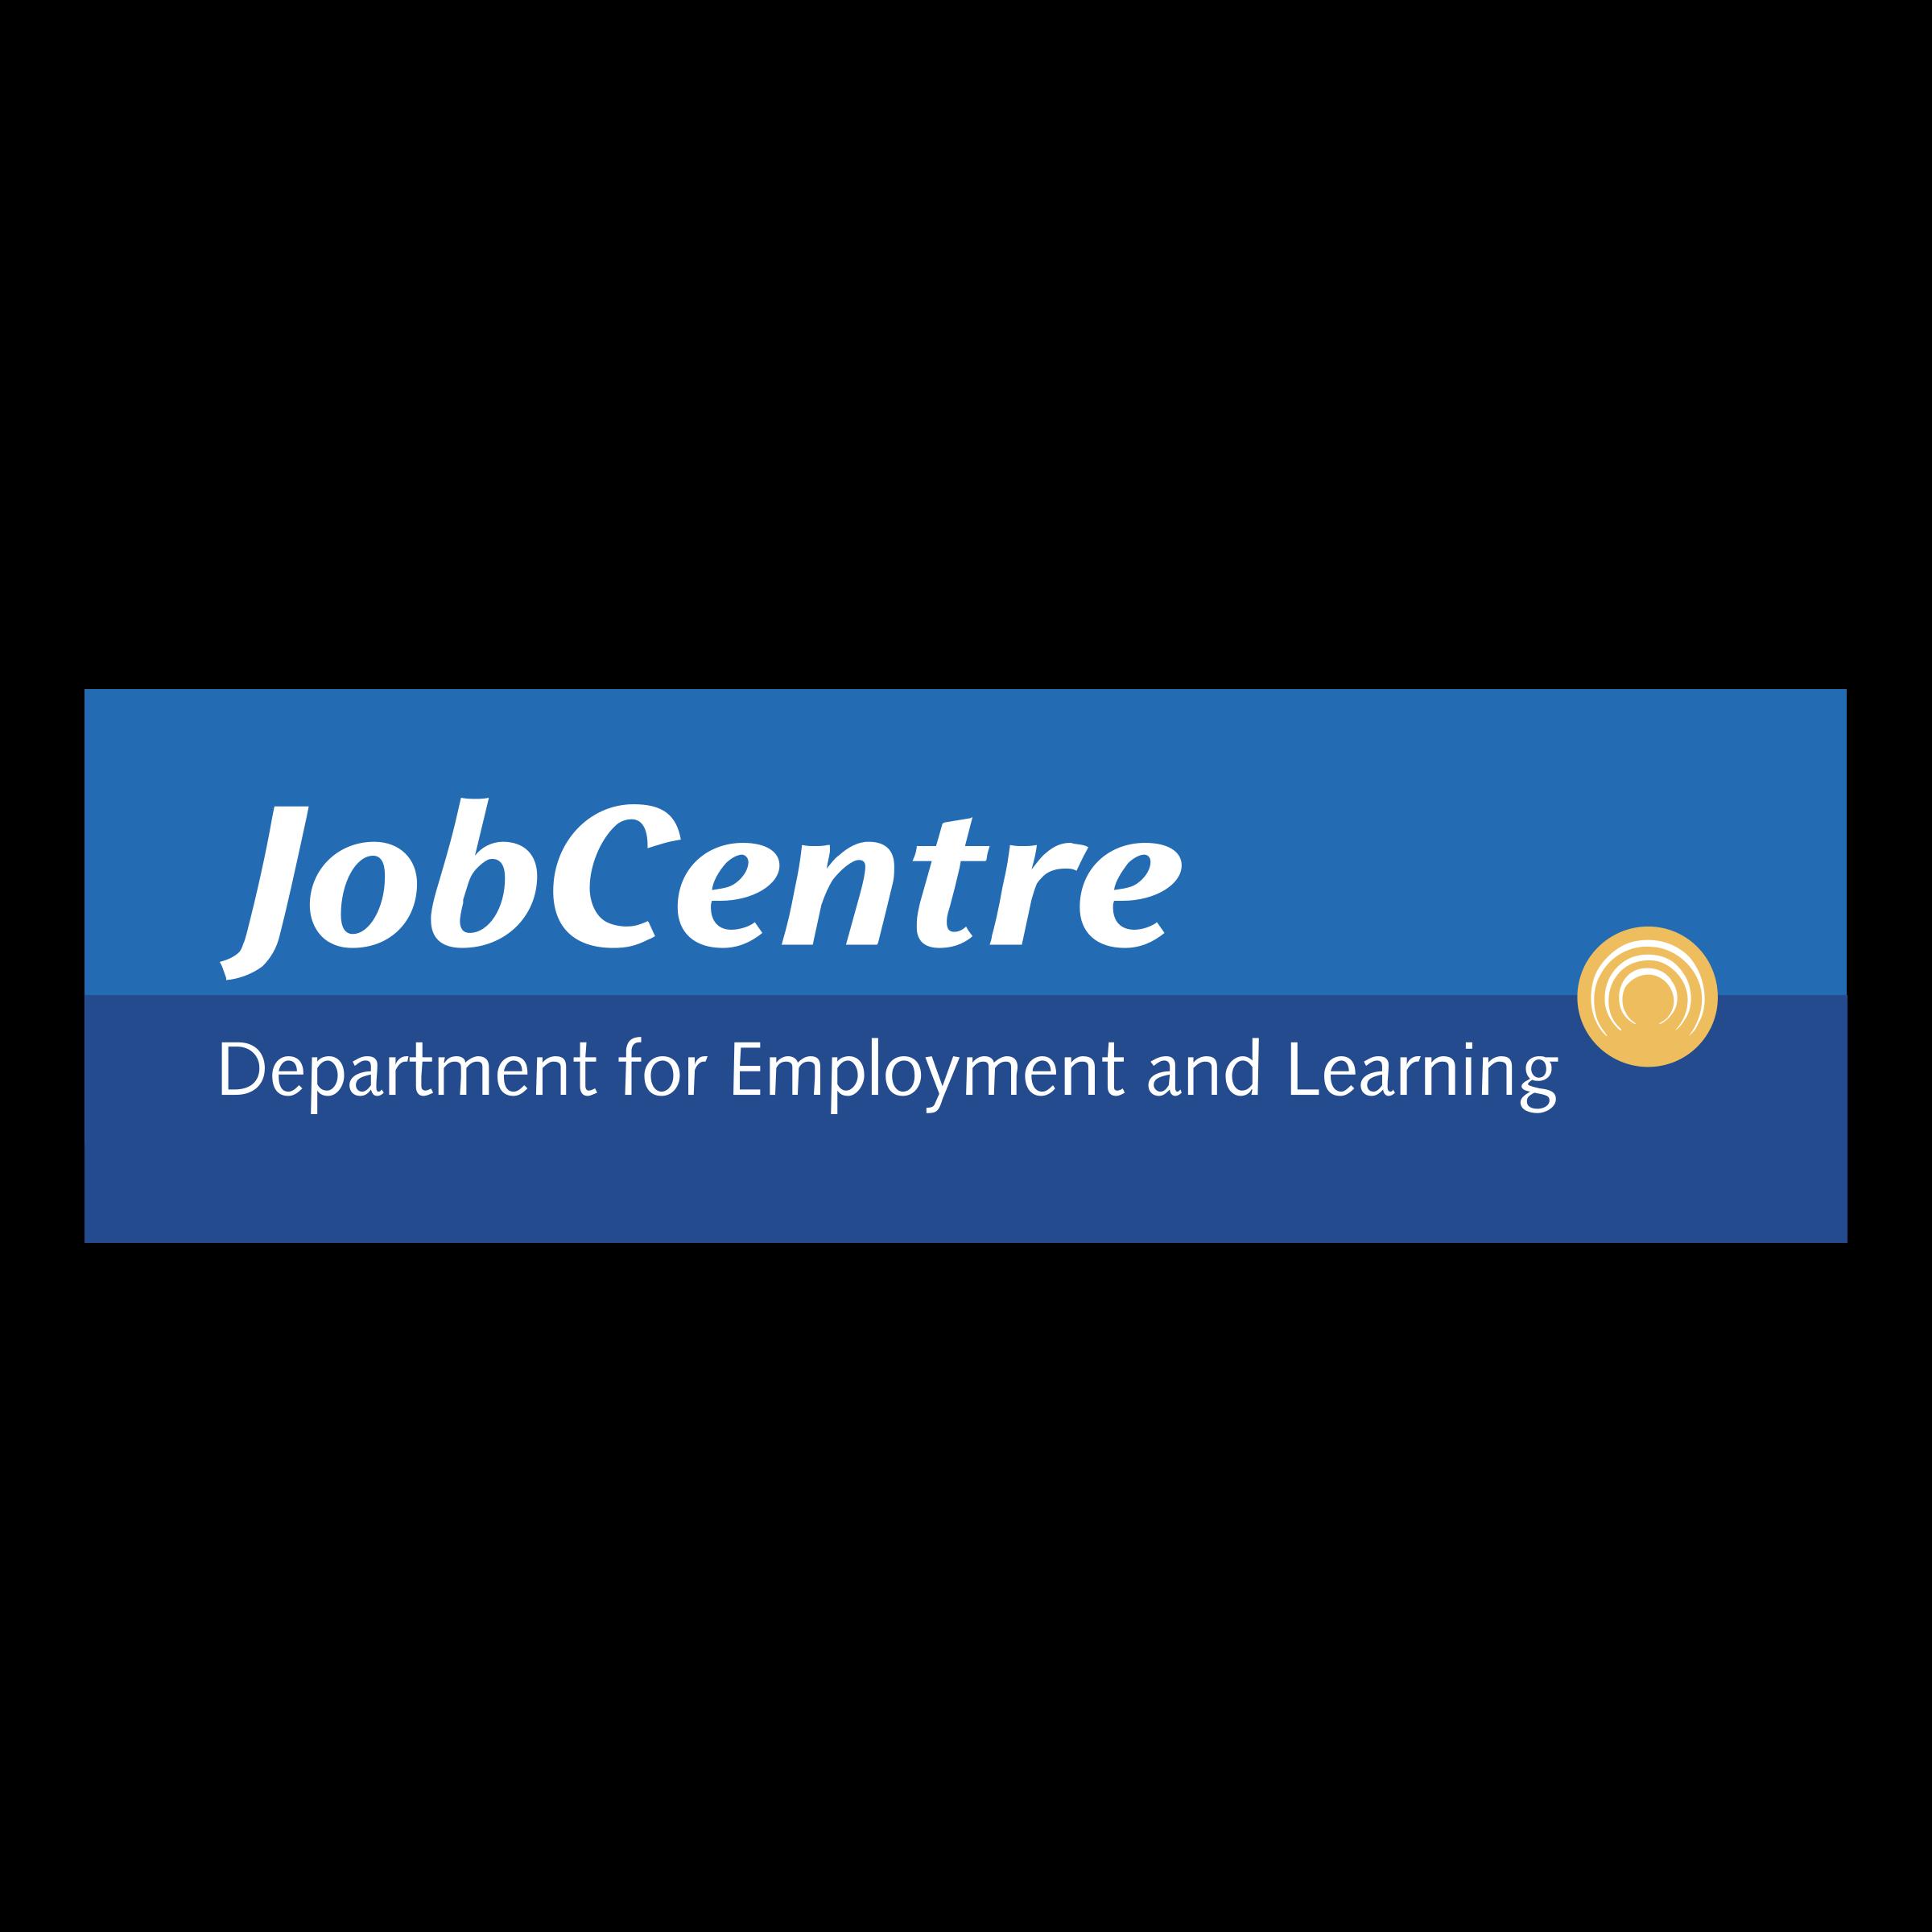 Job Centre Logo Png Transparent Svg Vector Freebie Supply